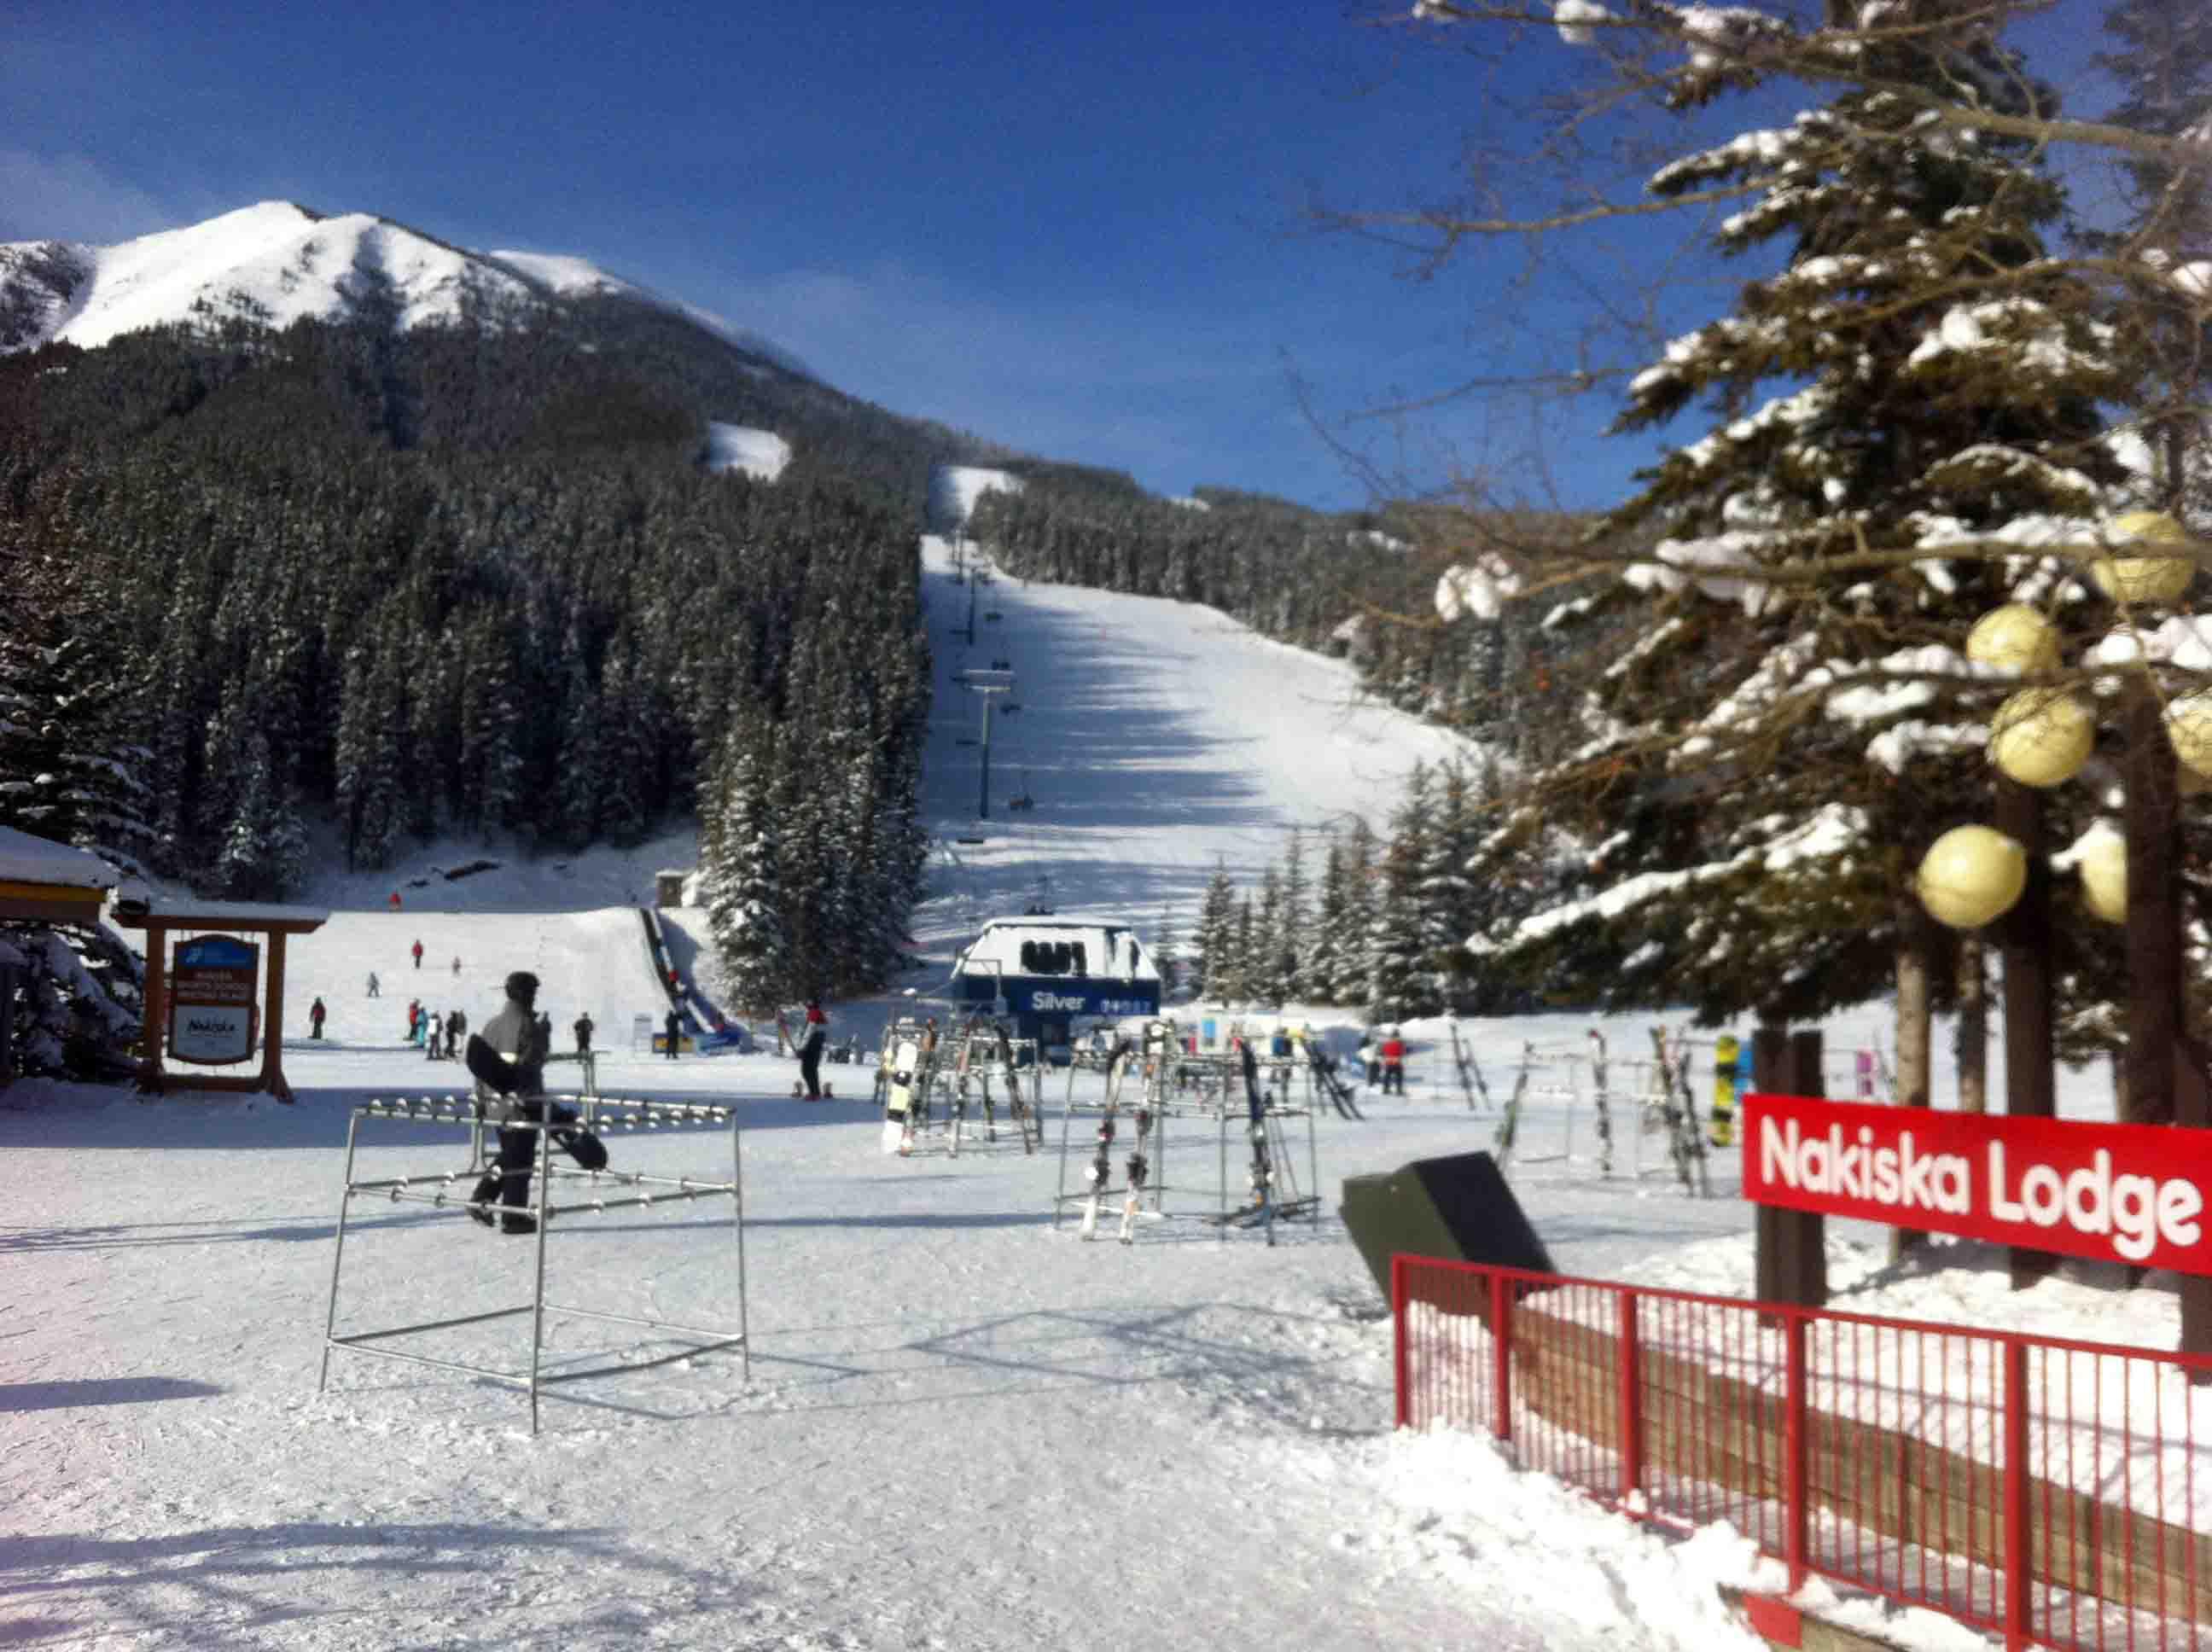 skiing nakiska in kananaskis country, alberta, canada